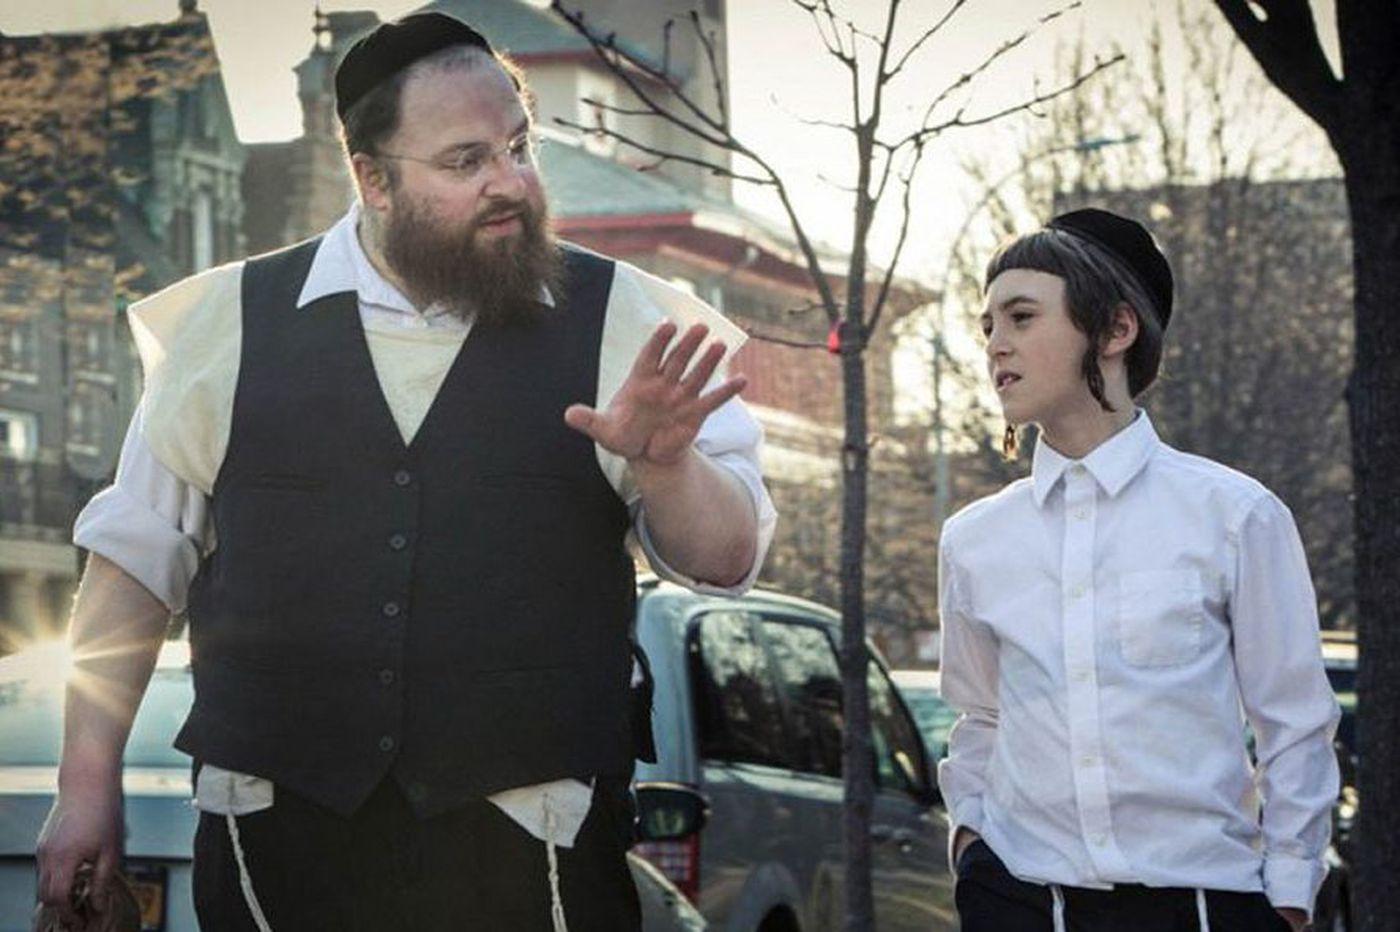 'Menashe' gives us rare insight into Brooklyn's Hasidic culture